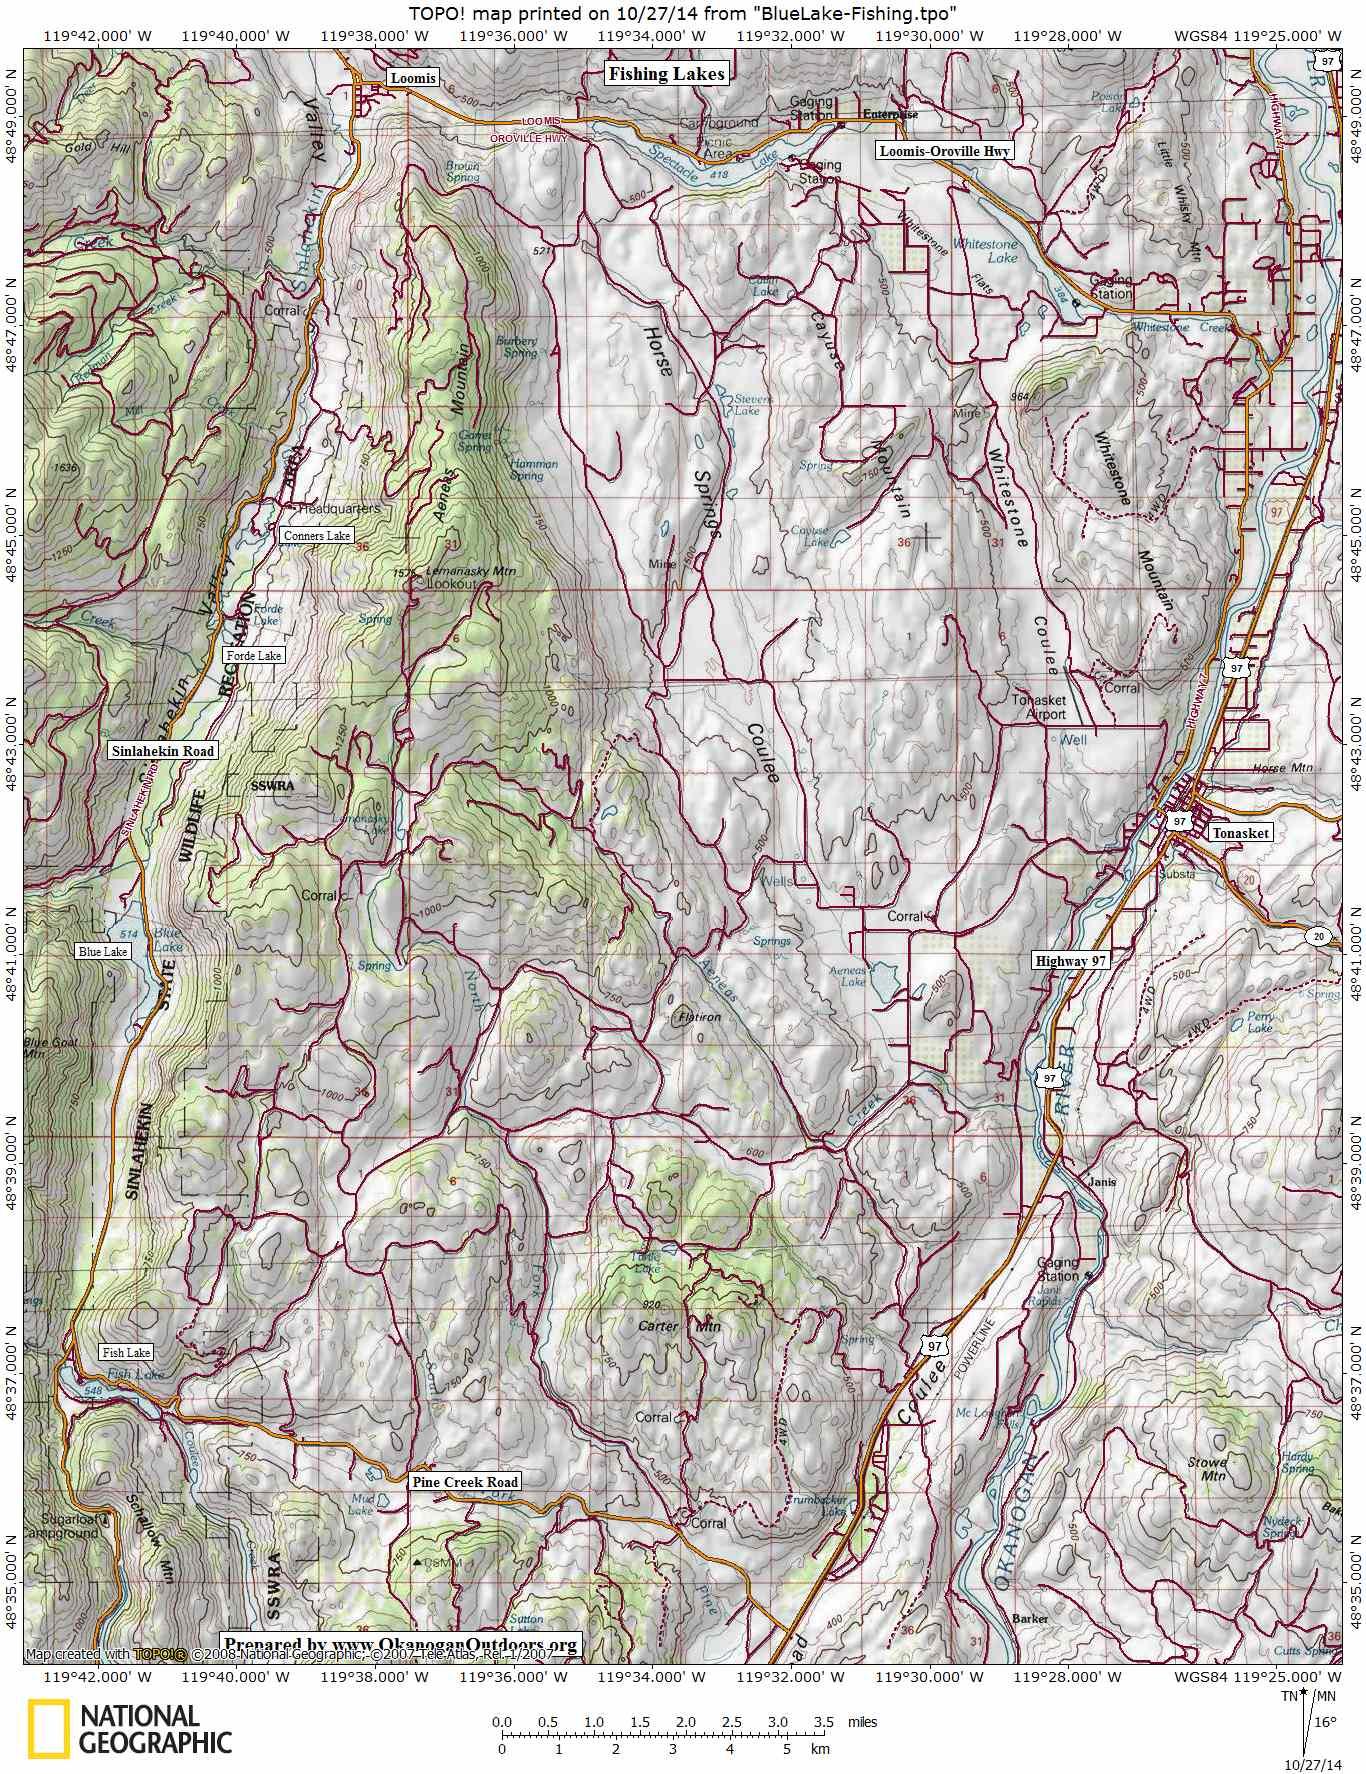 Tonasket Fire Map.Blue Lake Sinlahekin Wenatchee Outdoors